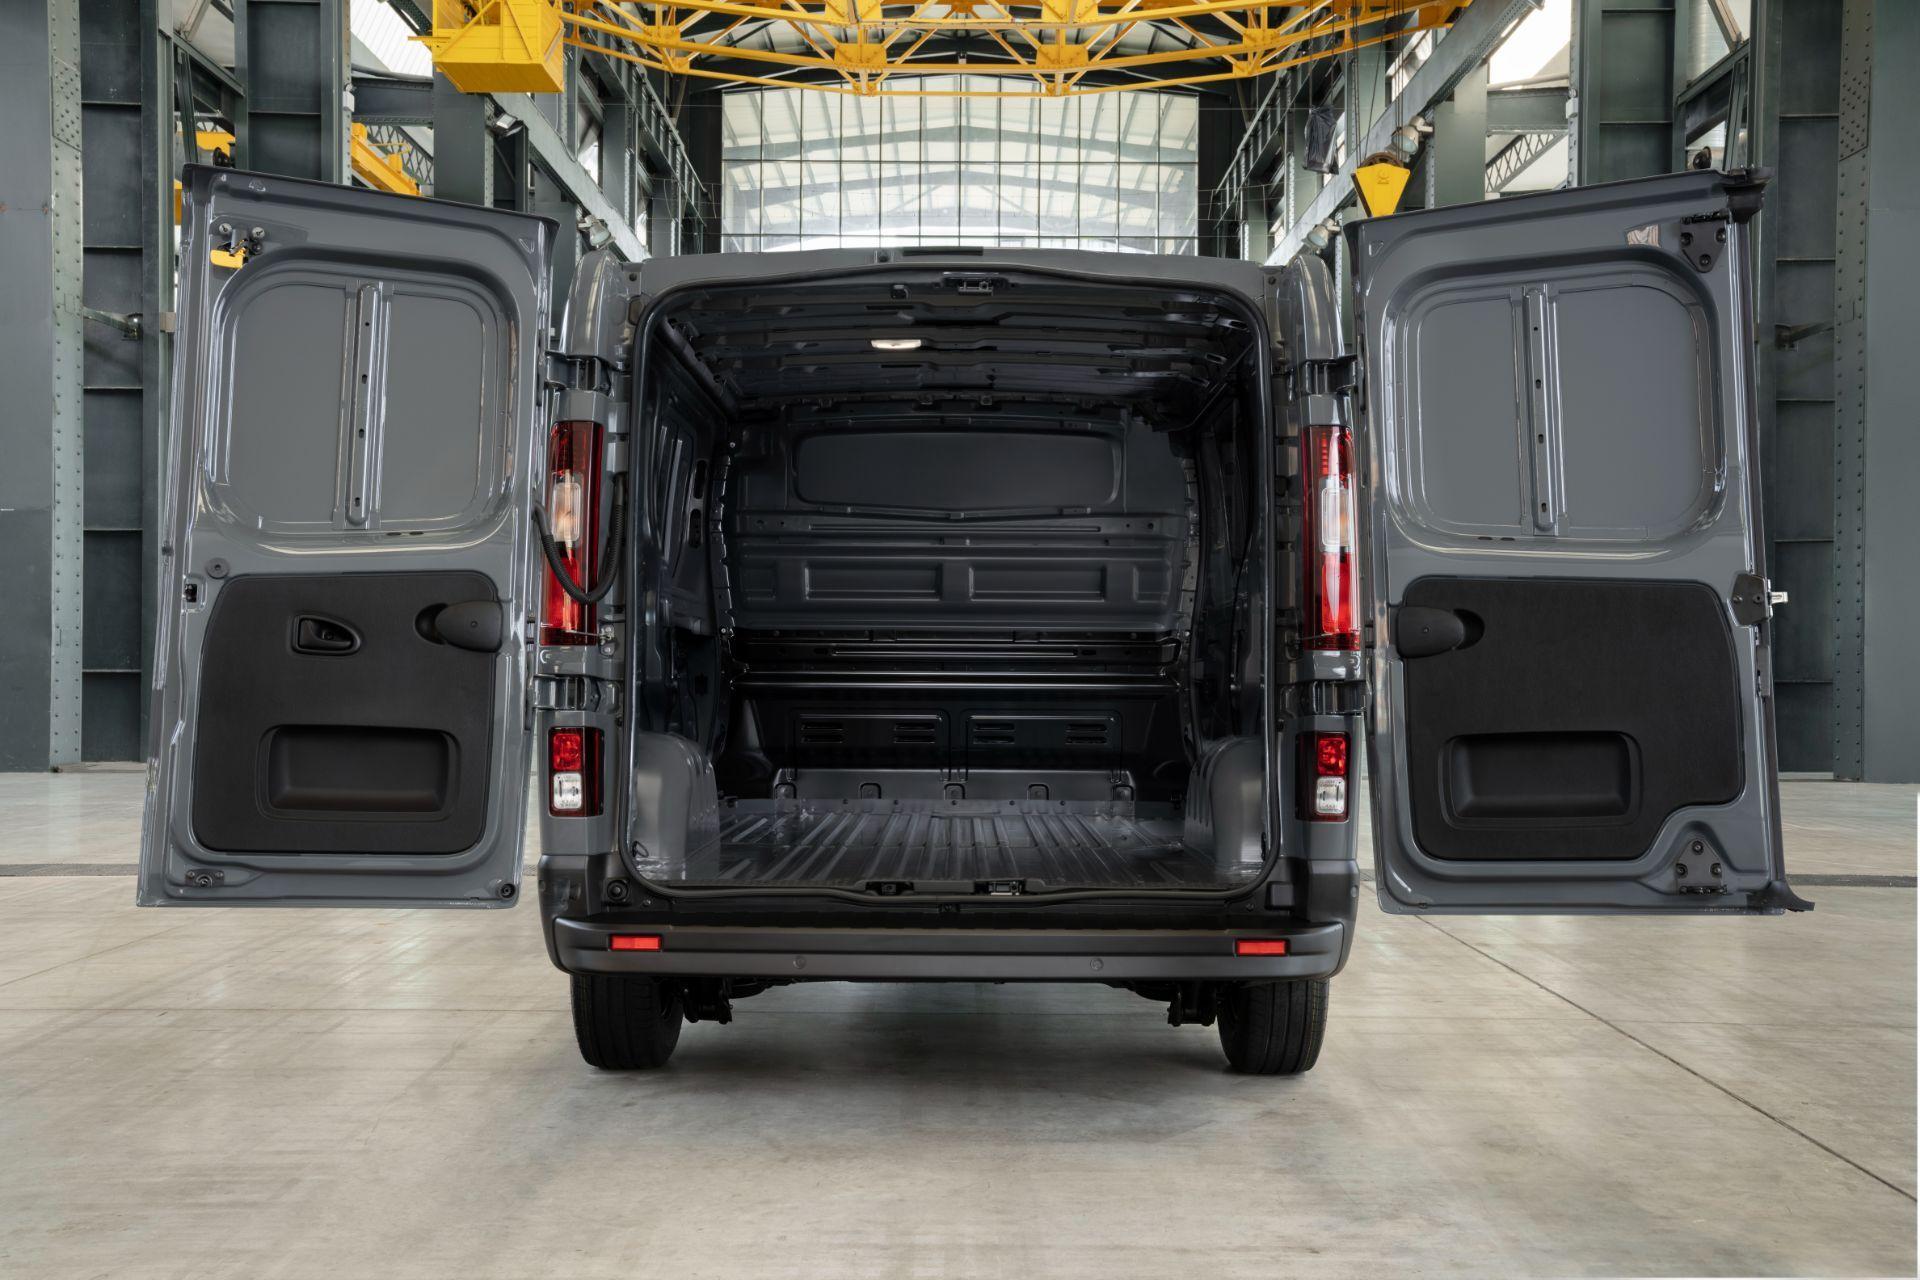 2022-Nissan-Primastar-Van-6-1